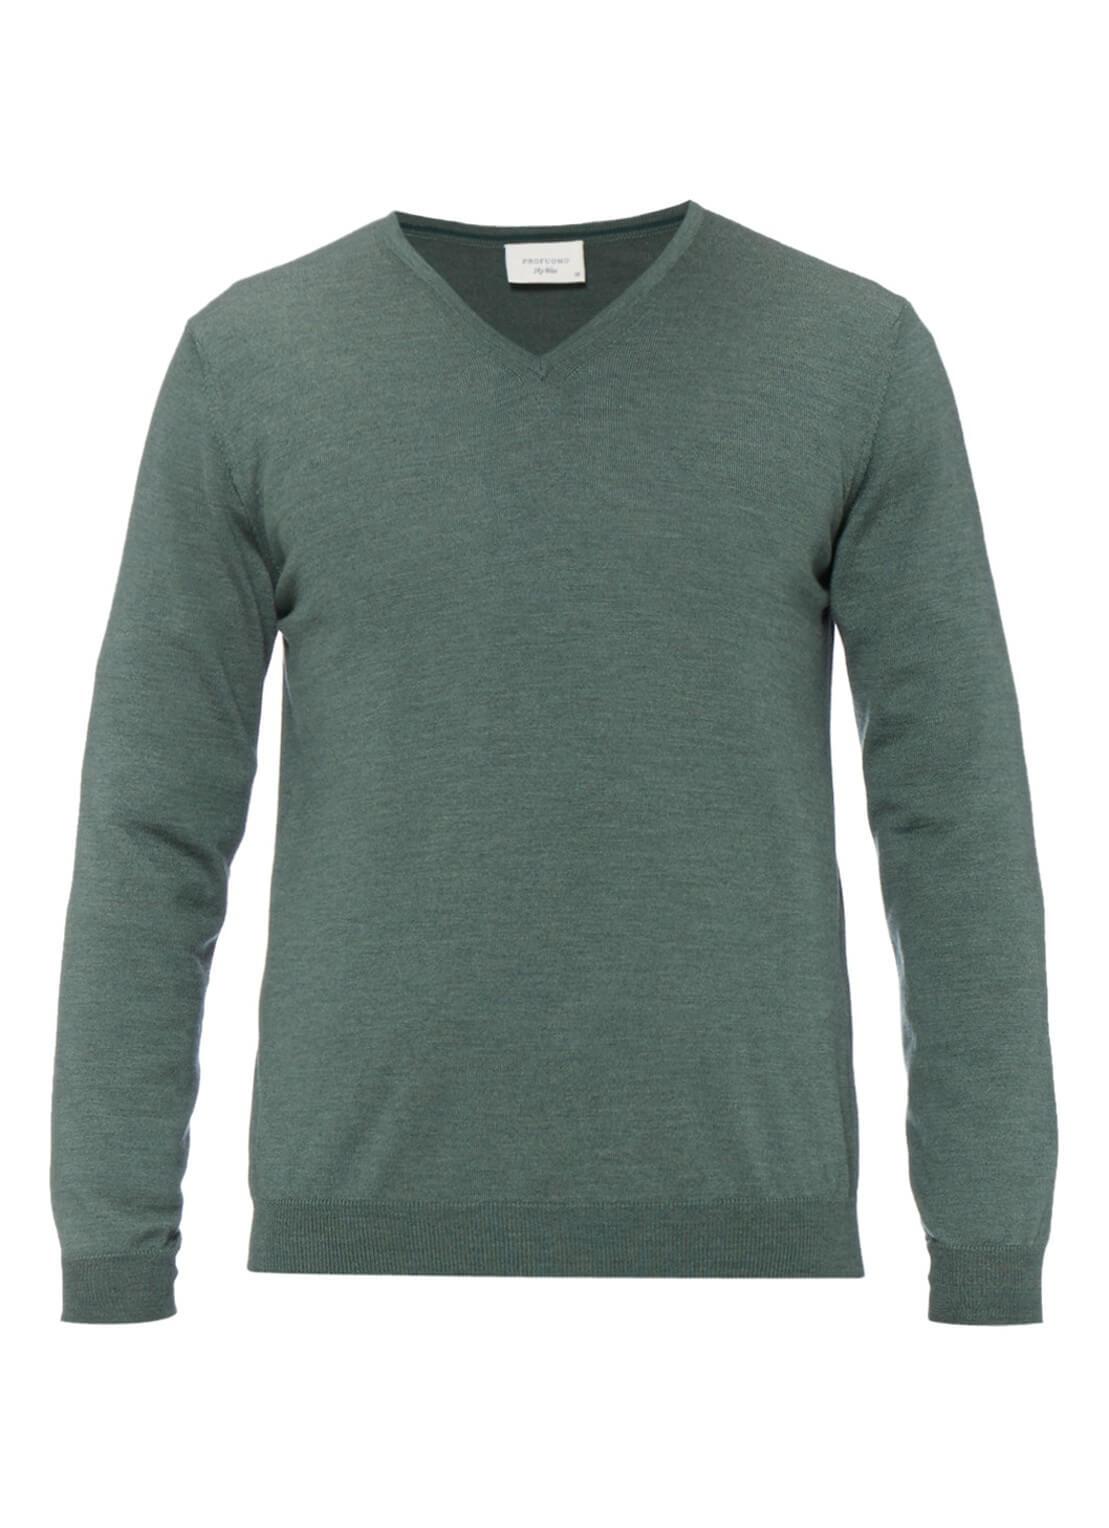 Sweaters - Mr.Draper